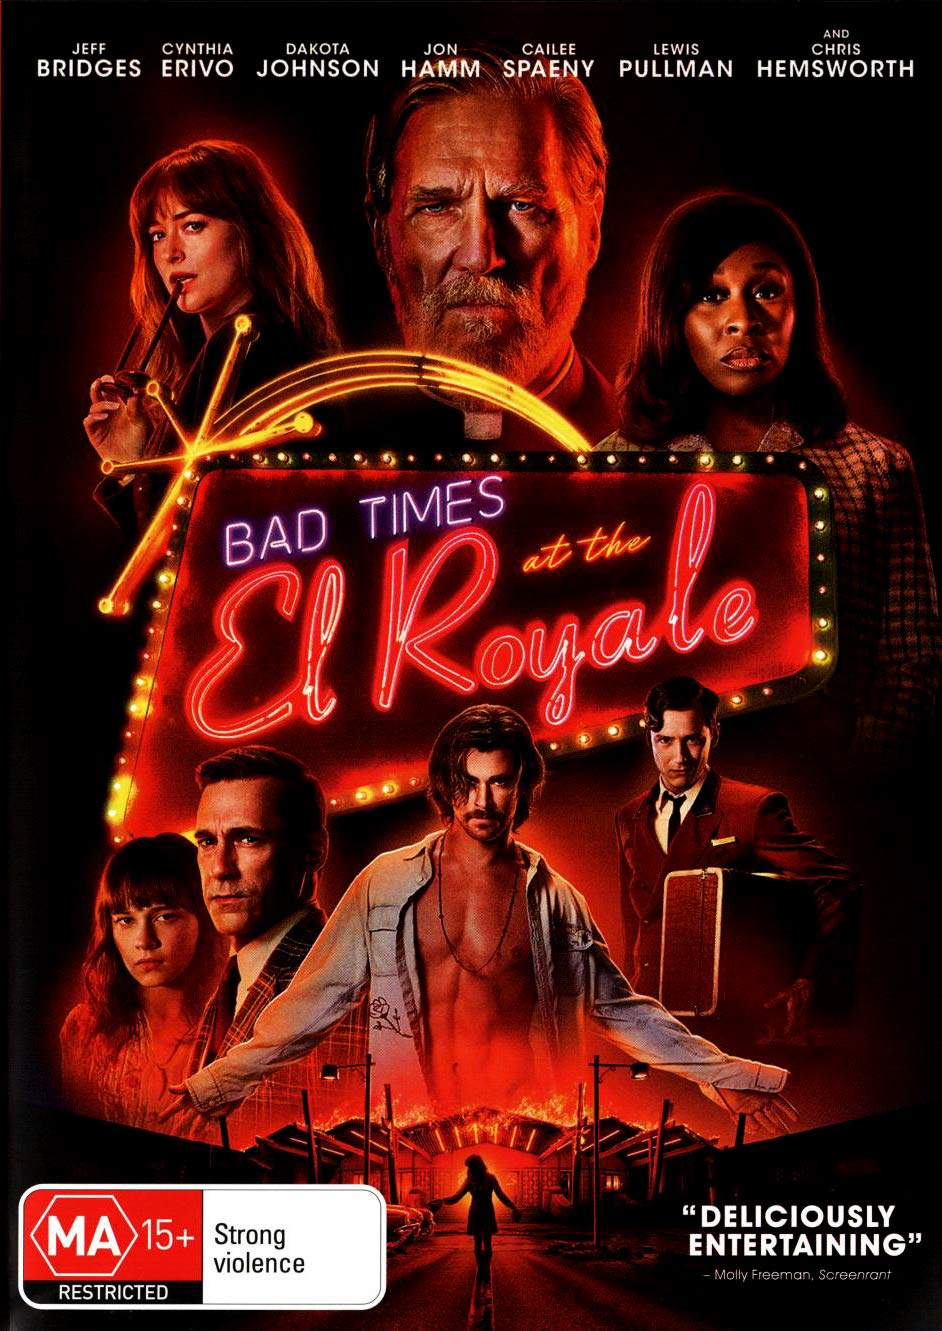 Amazon Com Bad Times At The El Royale Cynthia Erivo Dakota Johnson Jon Hamm Jeff Bridges Drew Goddard Movies Tv